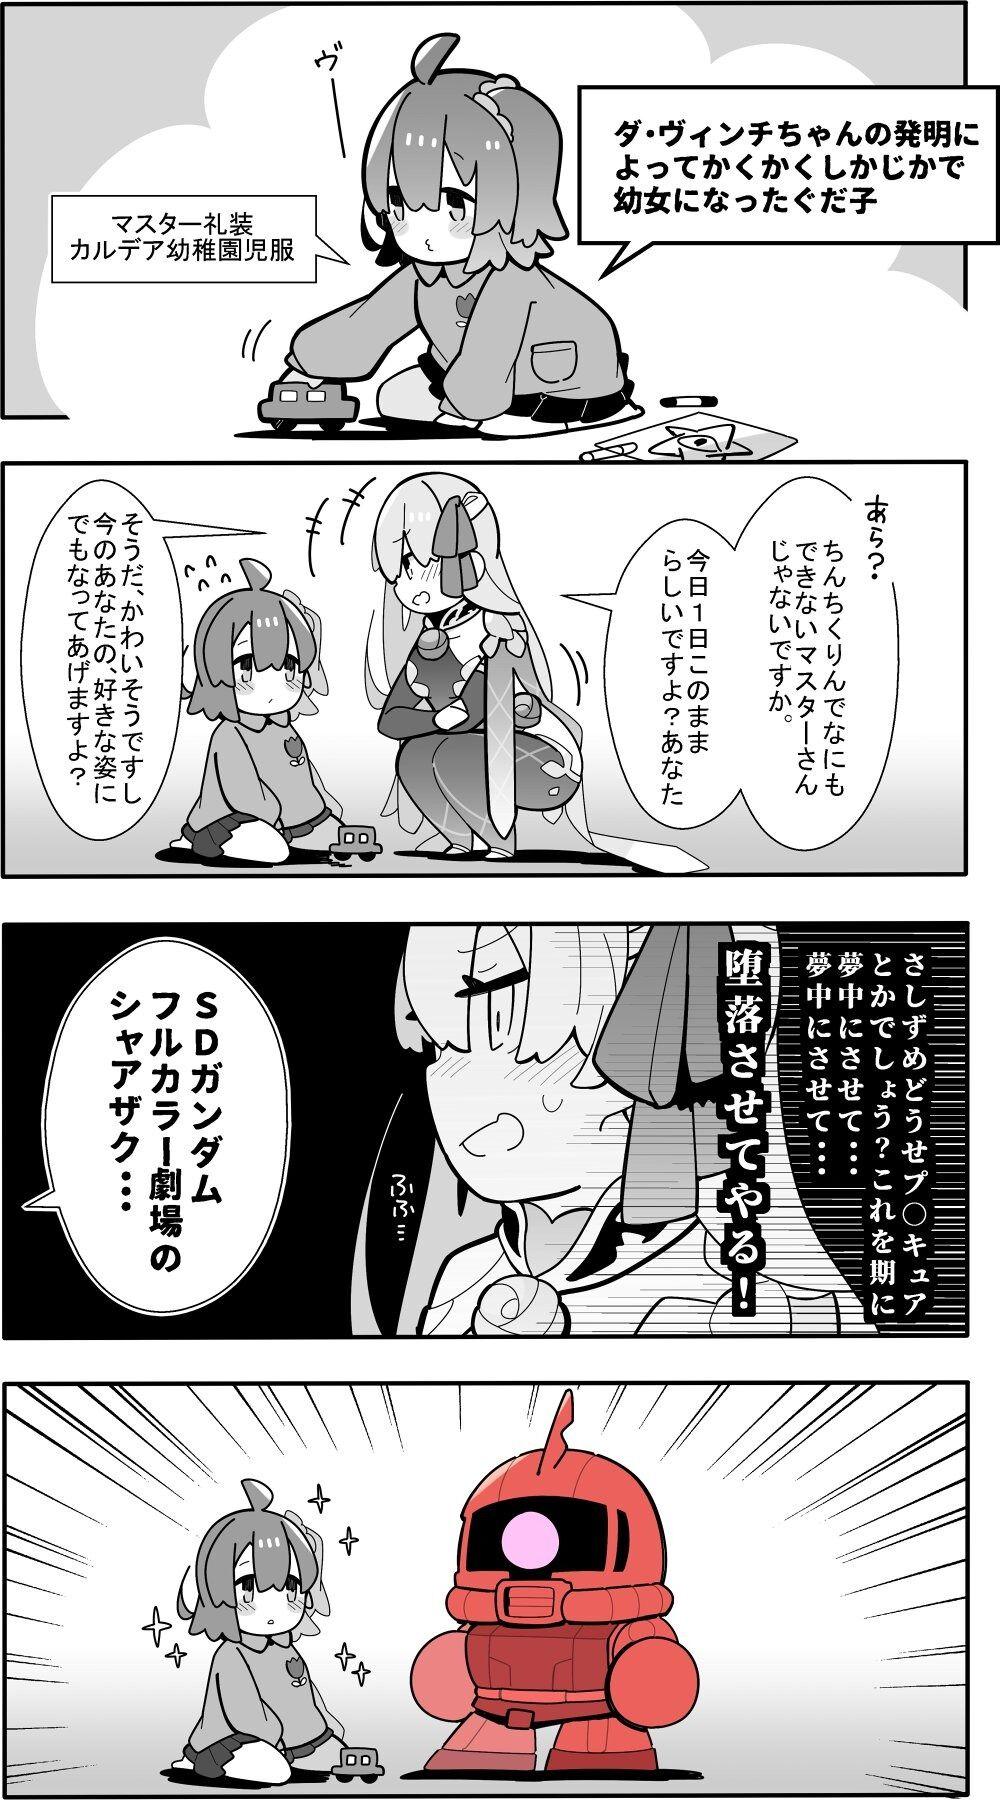 FGO】幼女ぐだ子の望む姿になるカーマちゃん!! 「SDガンダム ...